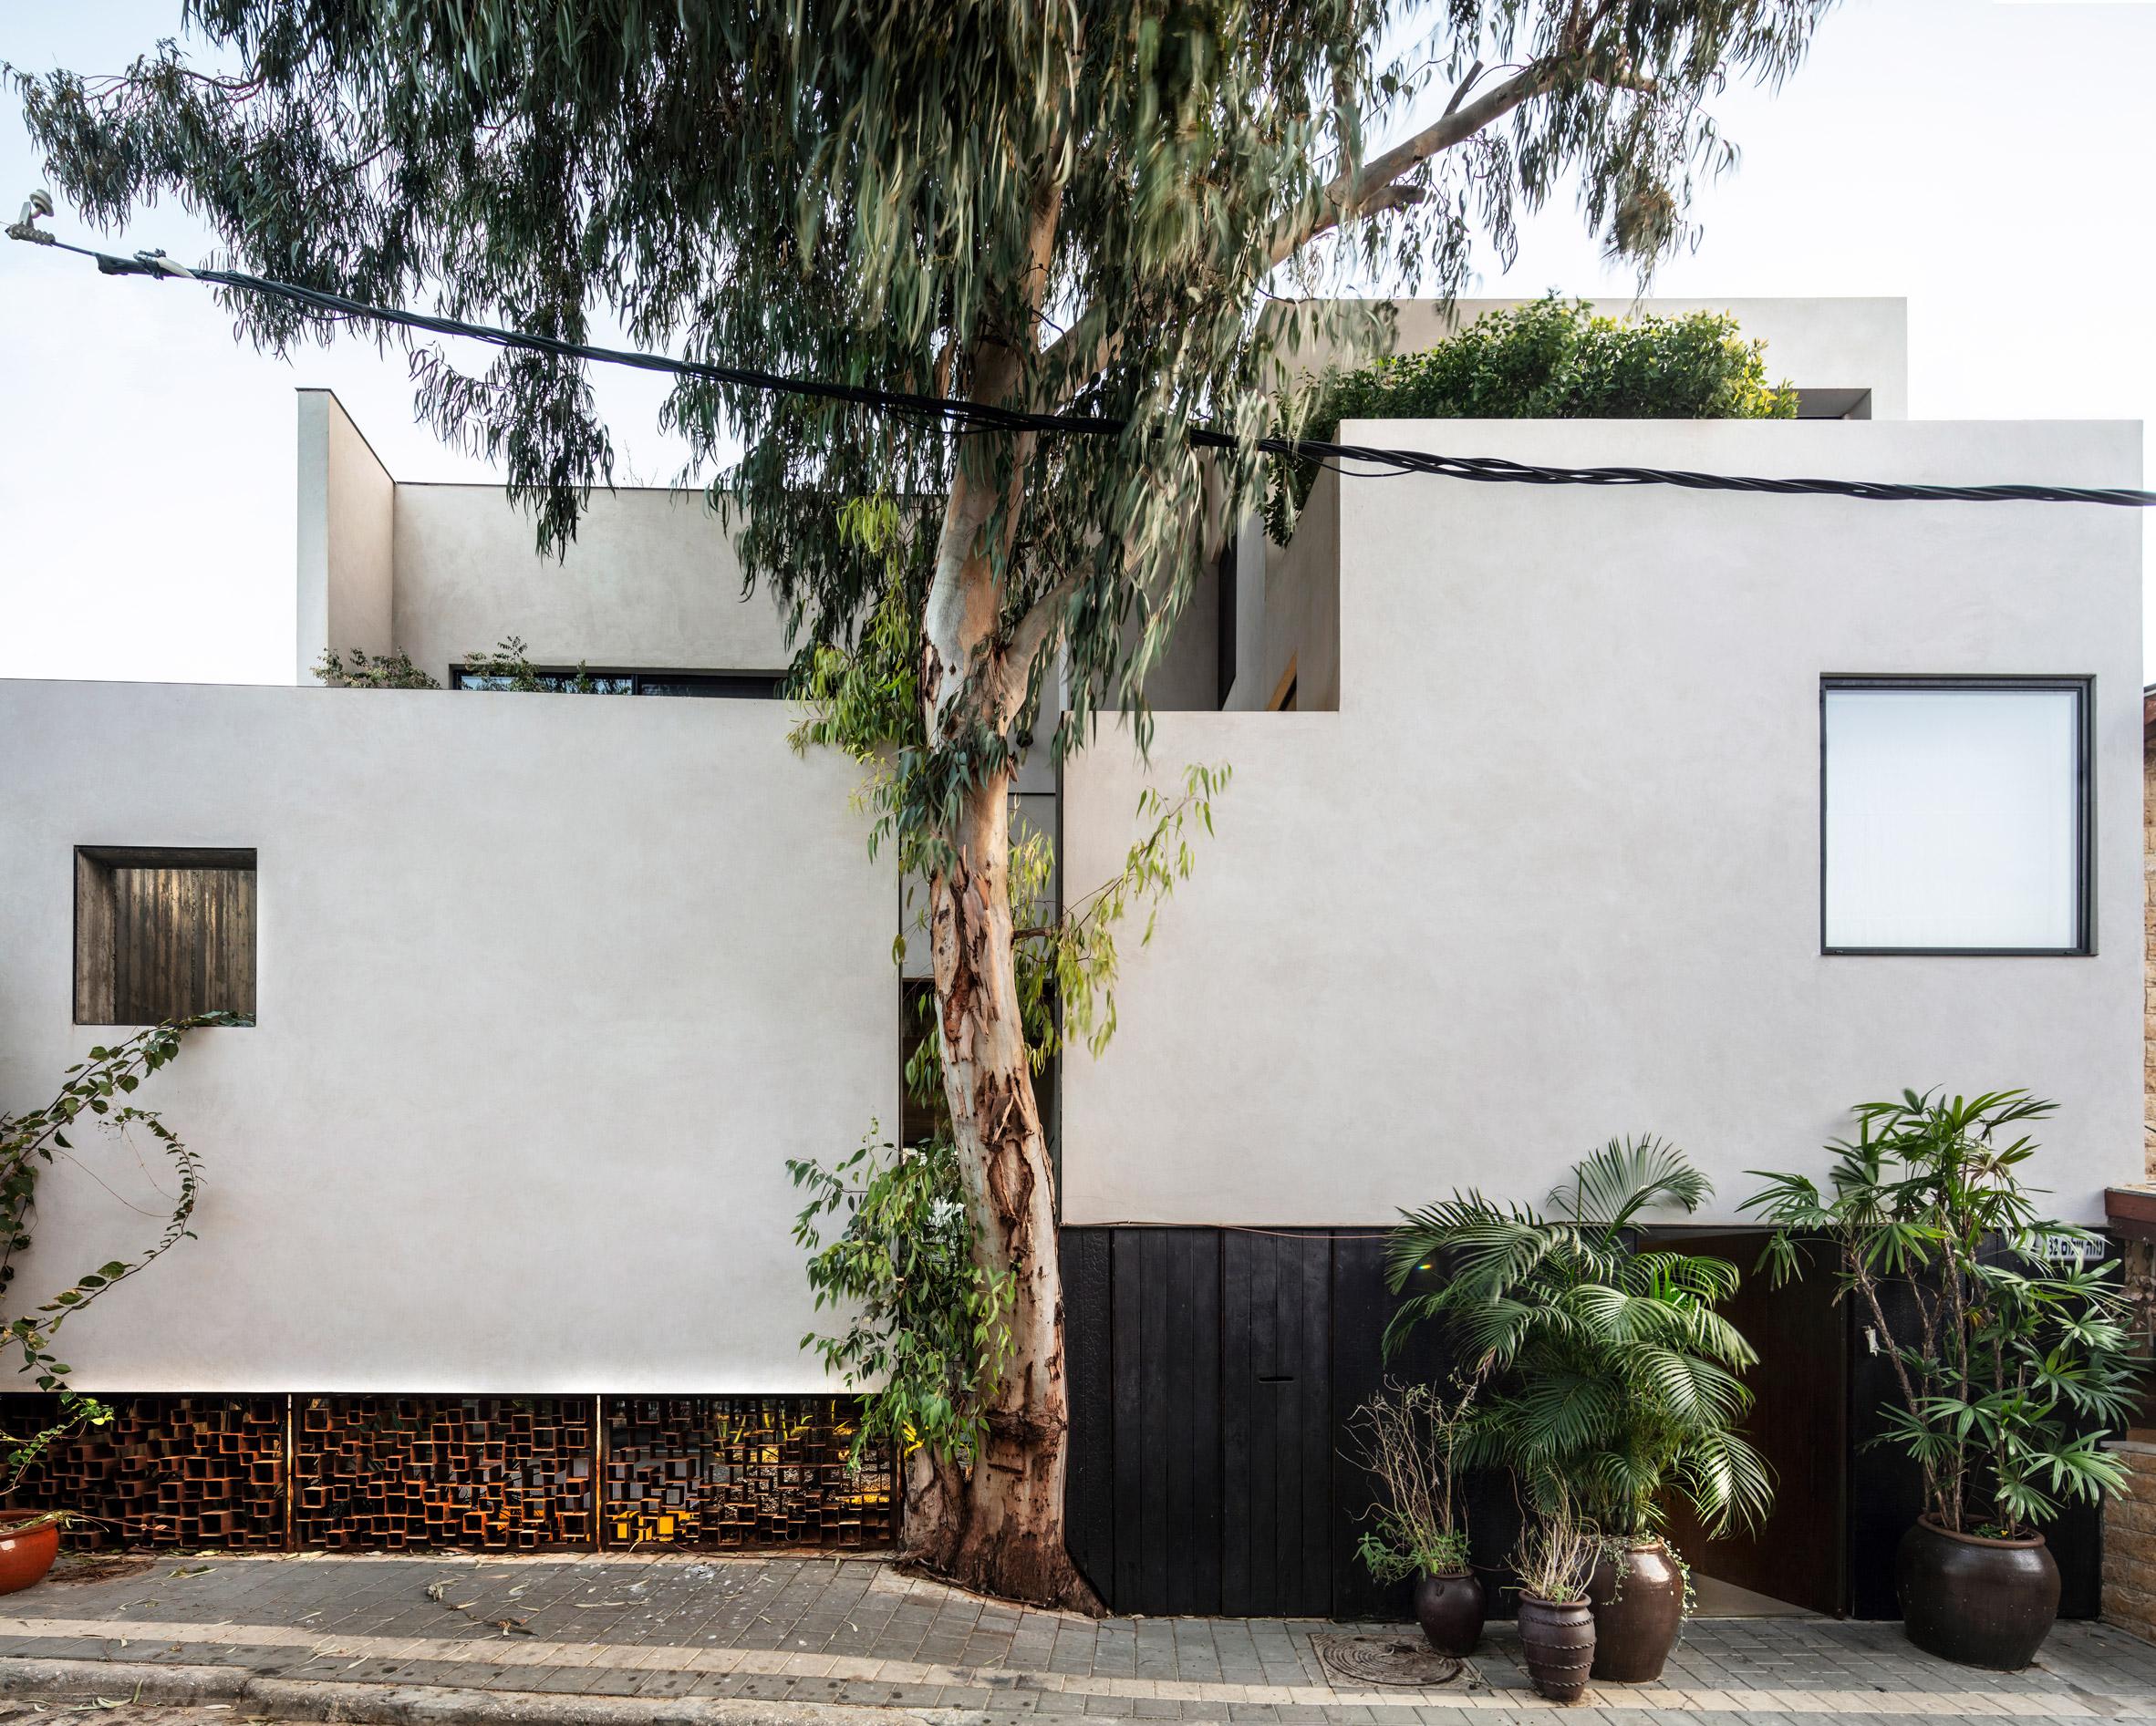 Tree in facade of Eucalyptus House by Paritzki & Liani Architects